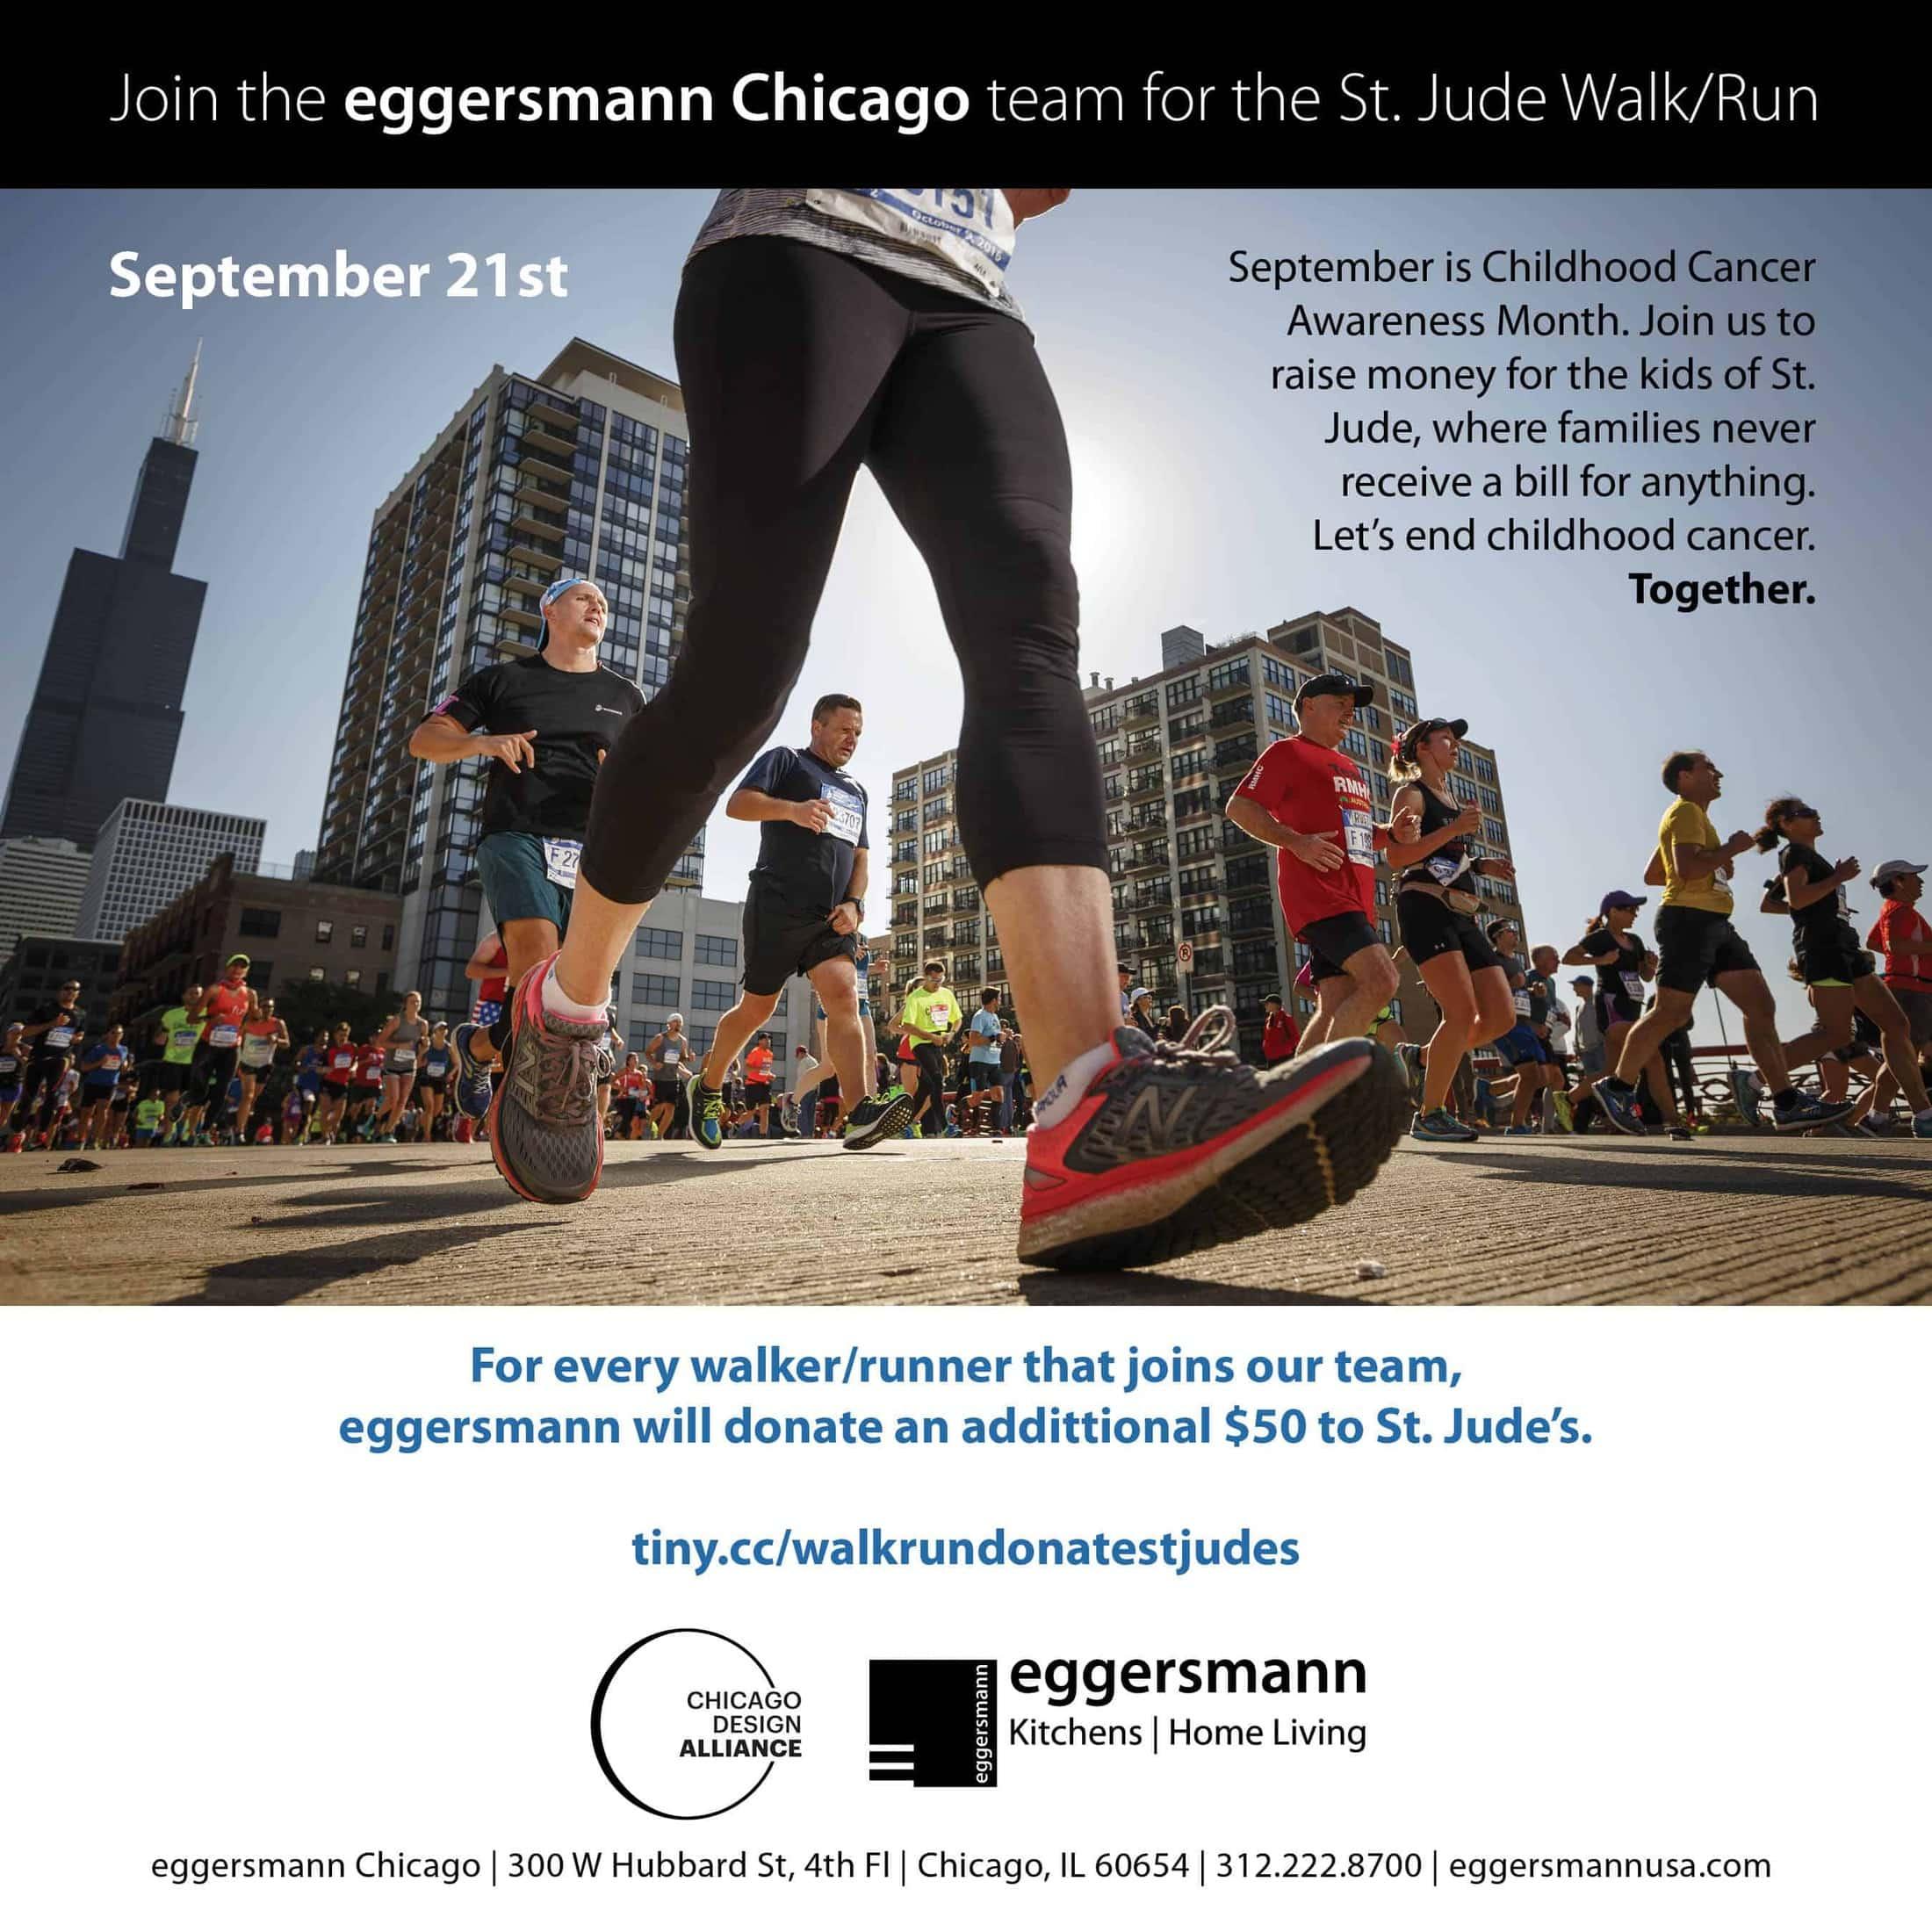 Join eggersmann chicago for the st jude's walk & run